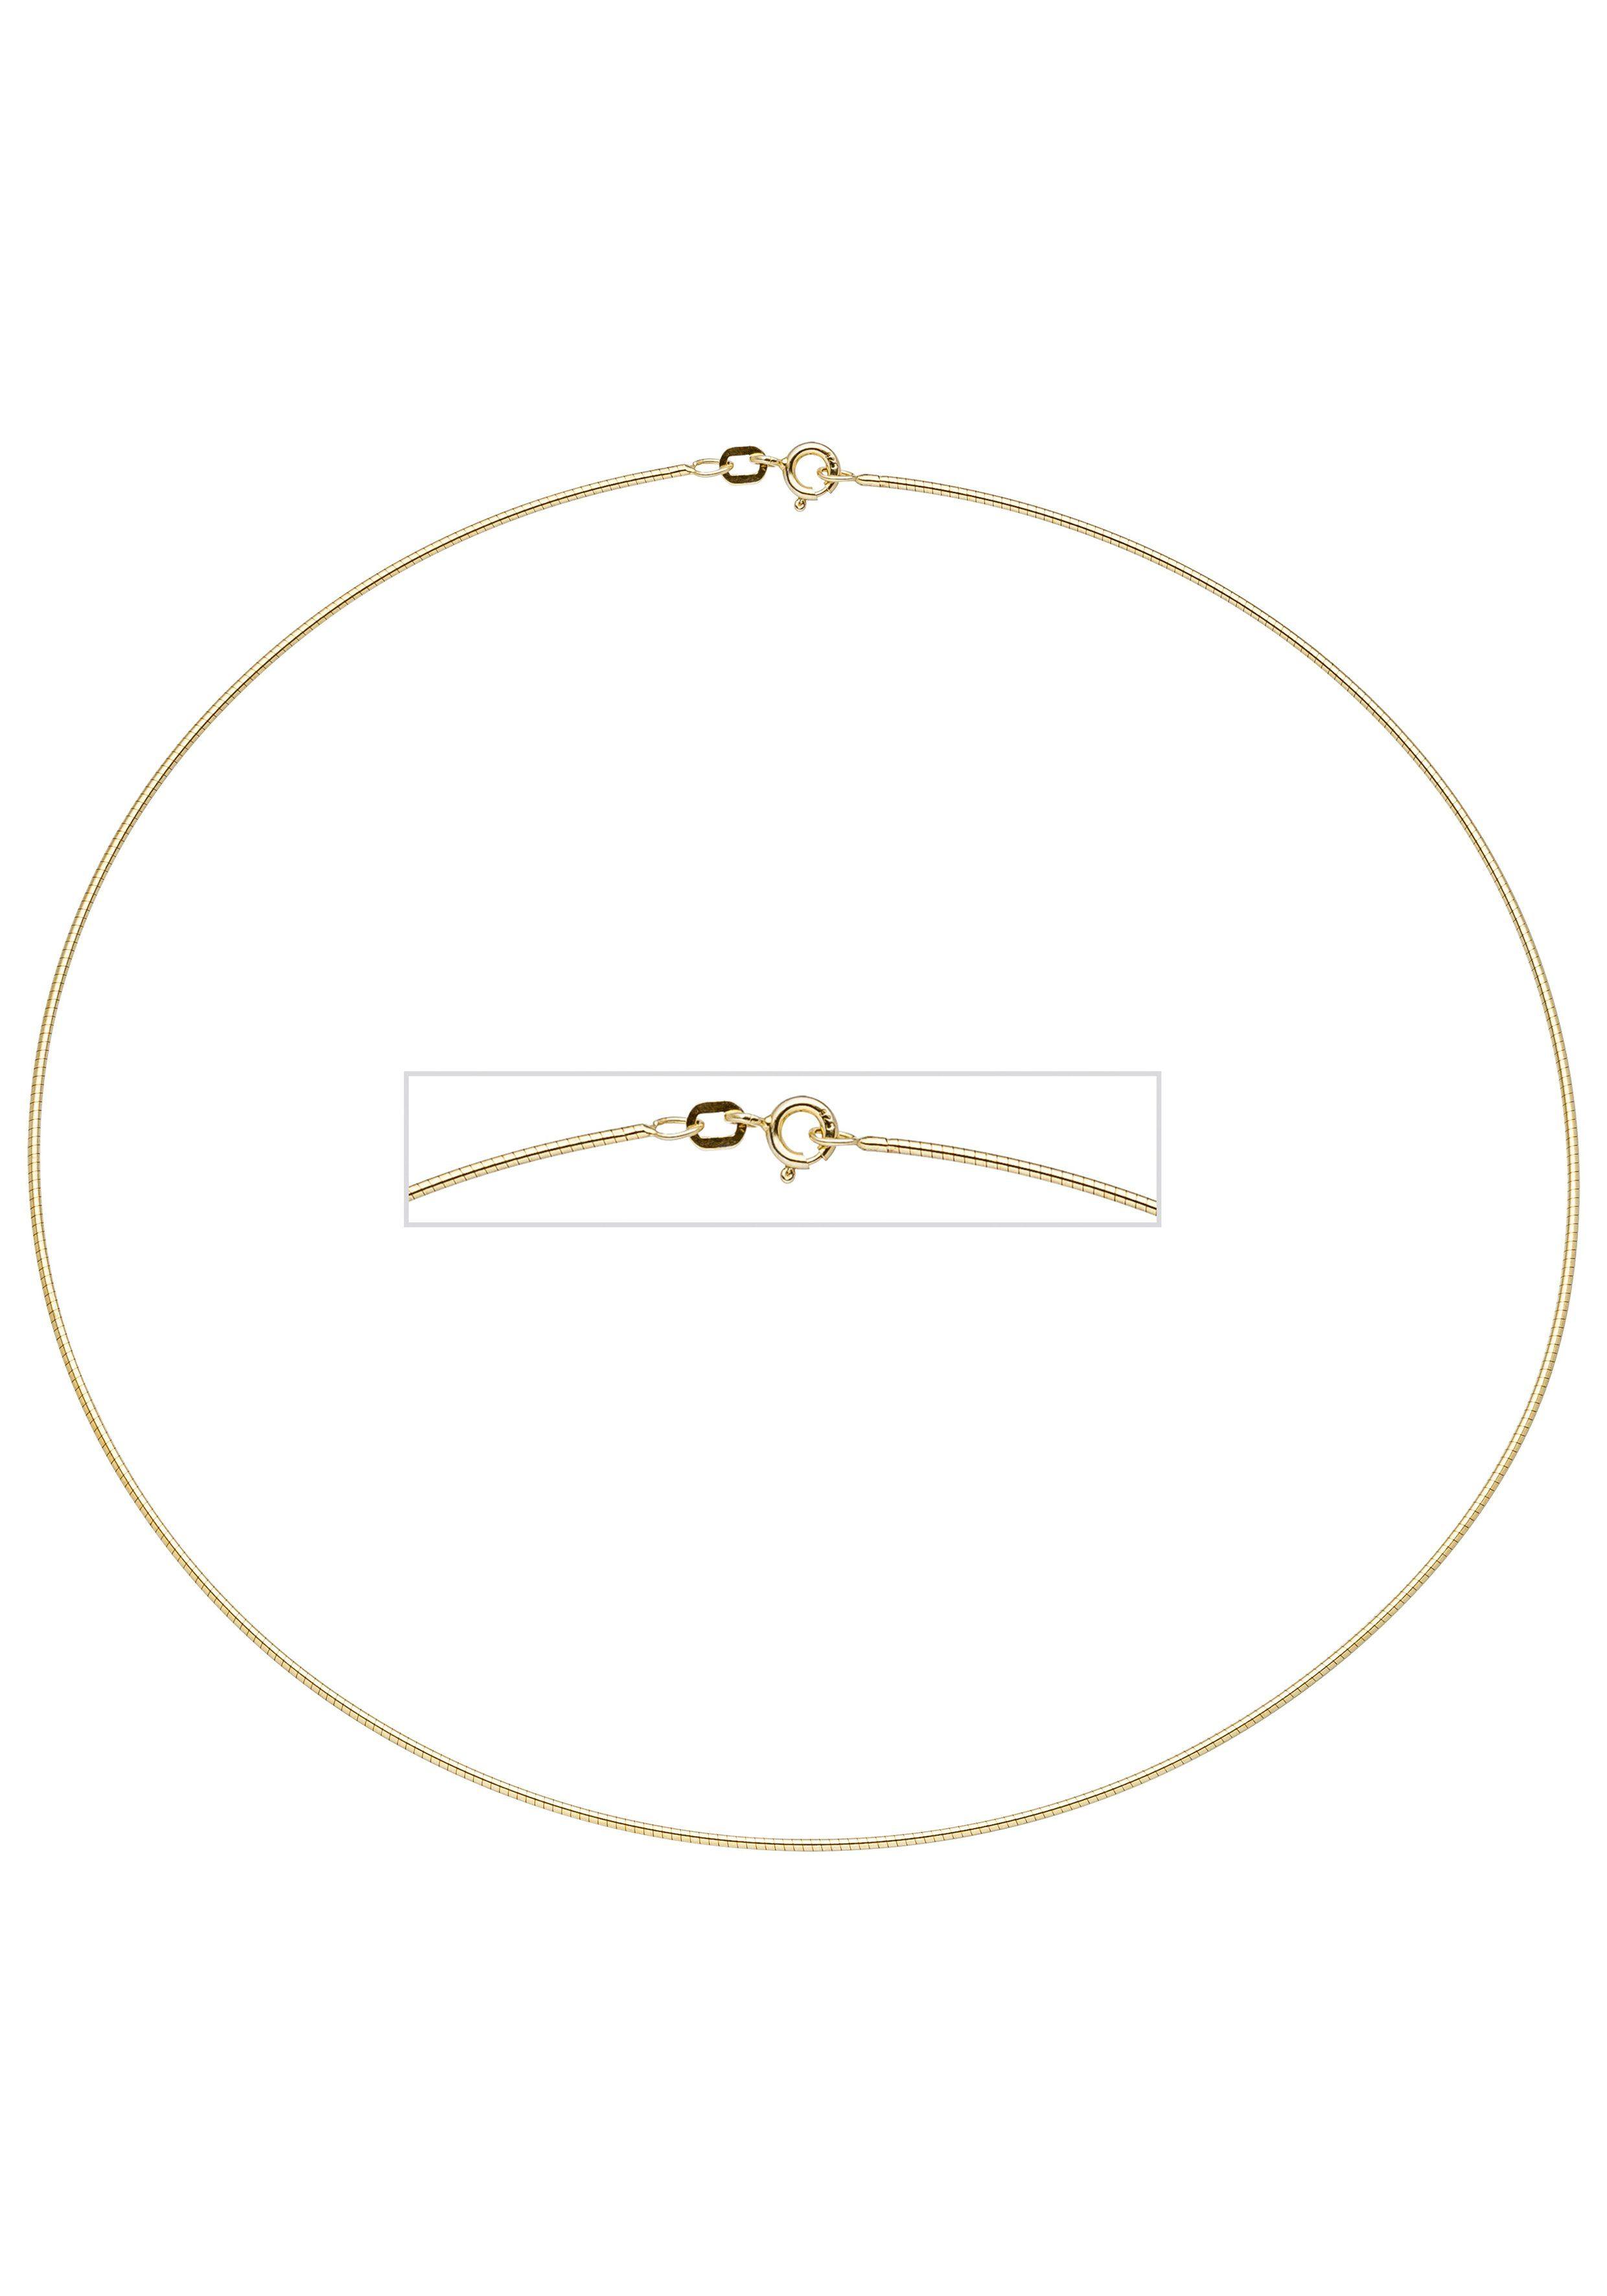 JOBO Halsreif 925 Silber vergoldet 45 cm 1,1 mm